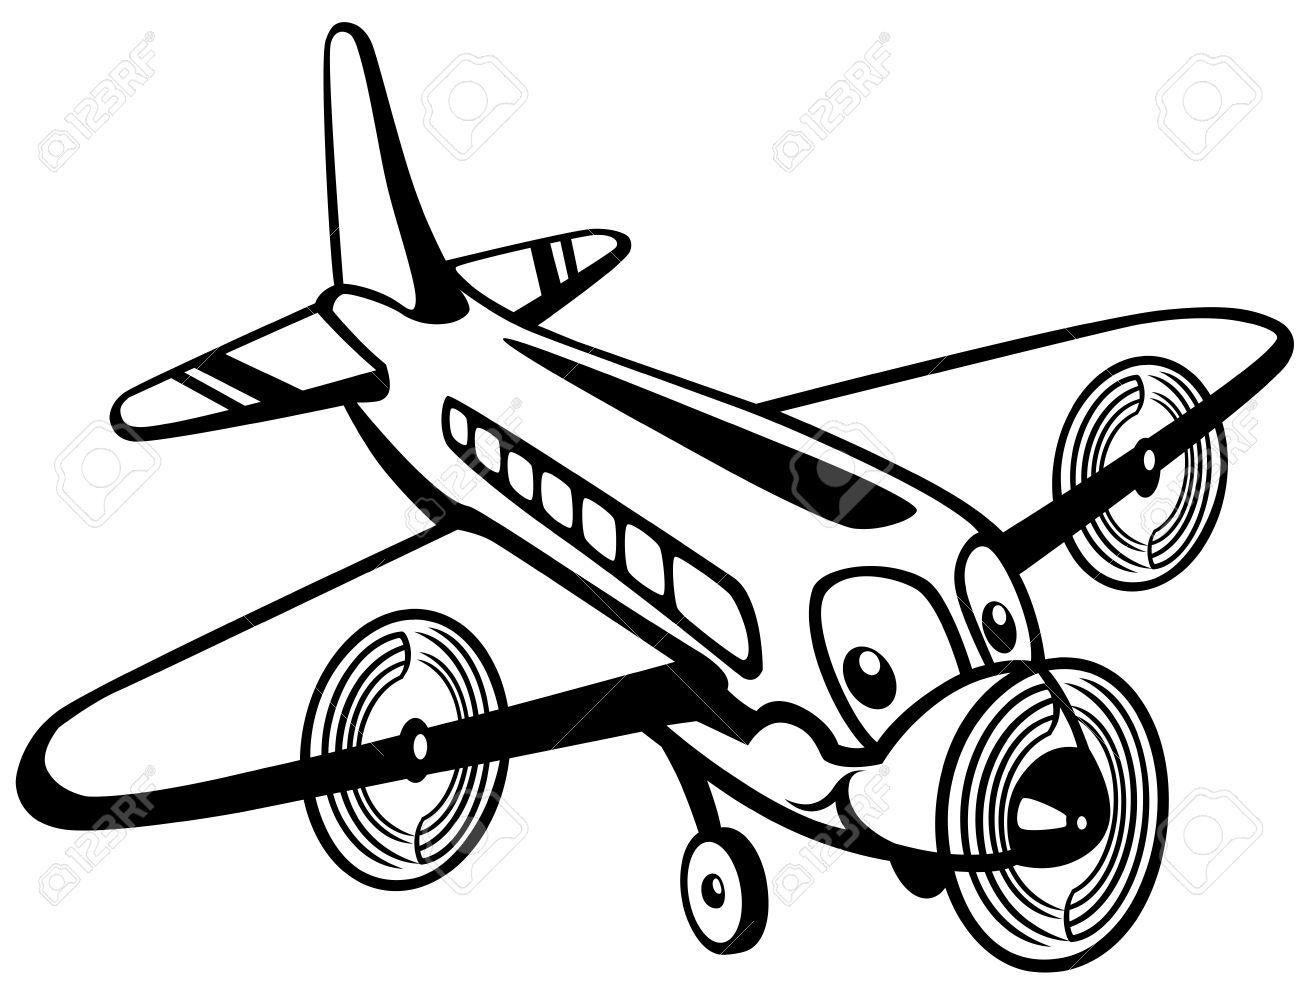 Aeroplane Drawing For Kids